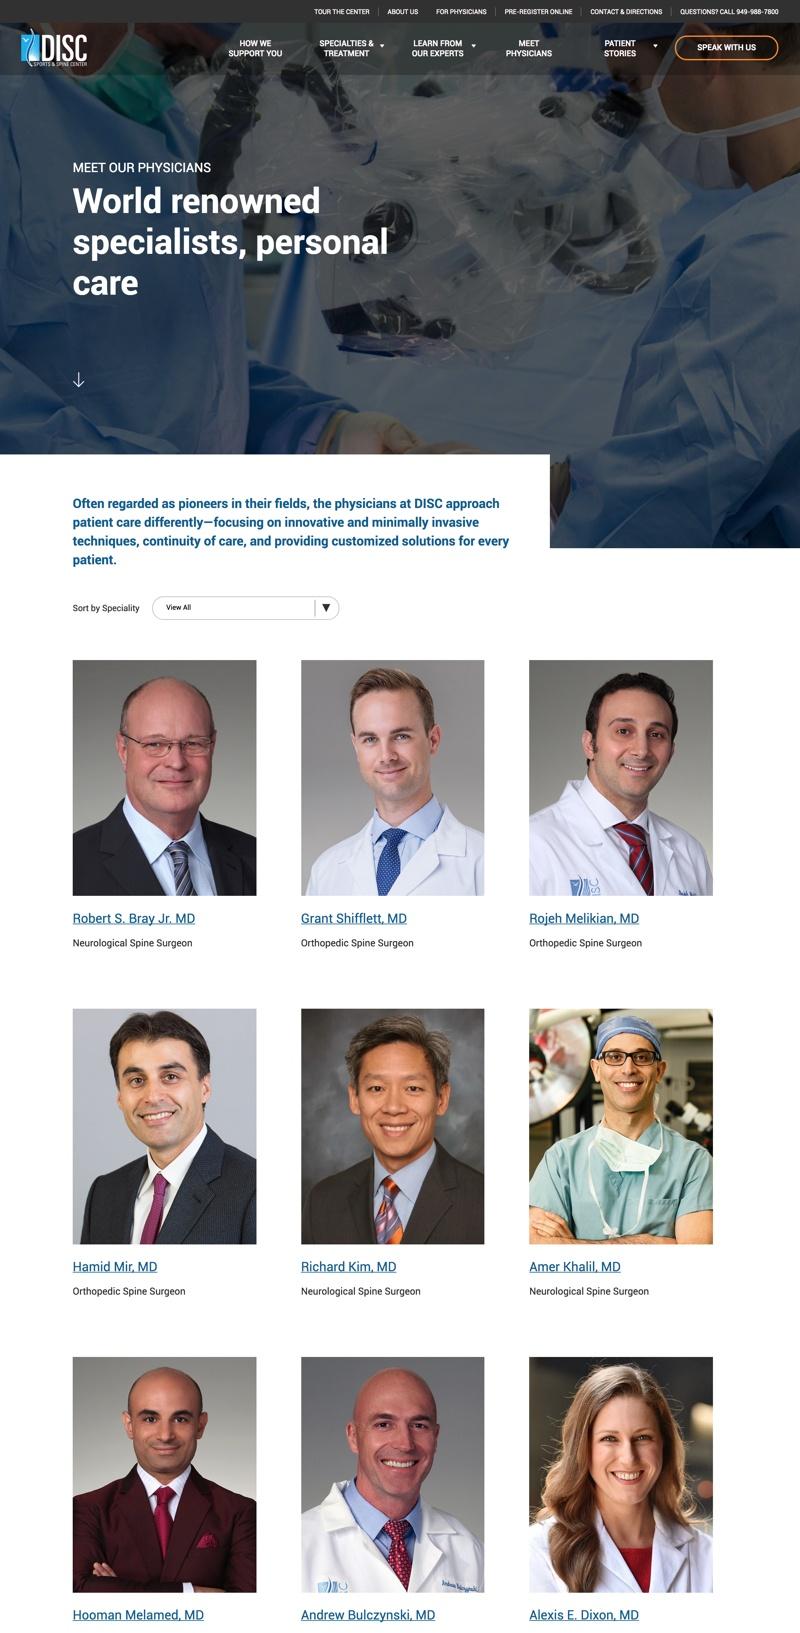 DISC web design showing medical professionals